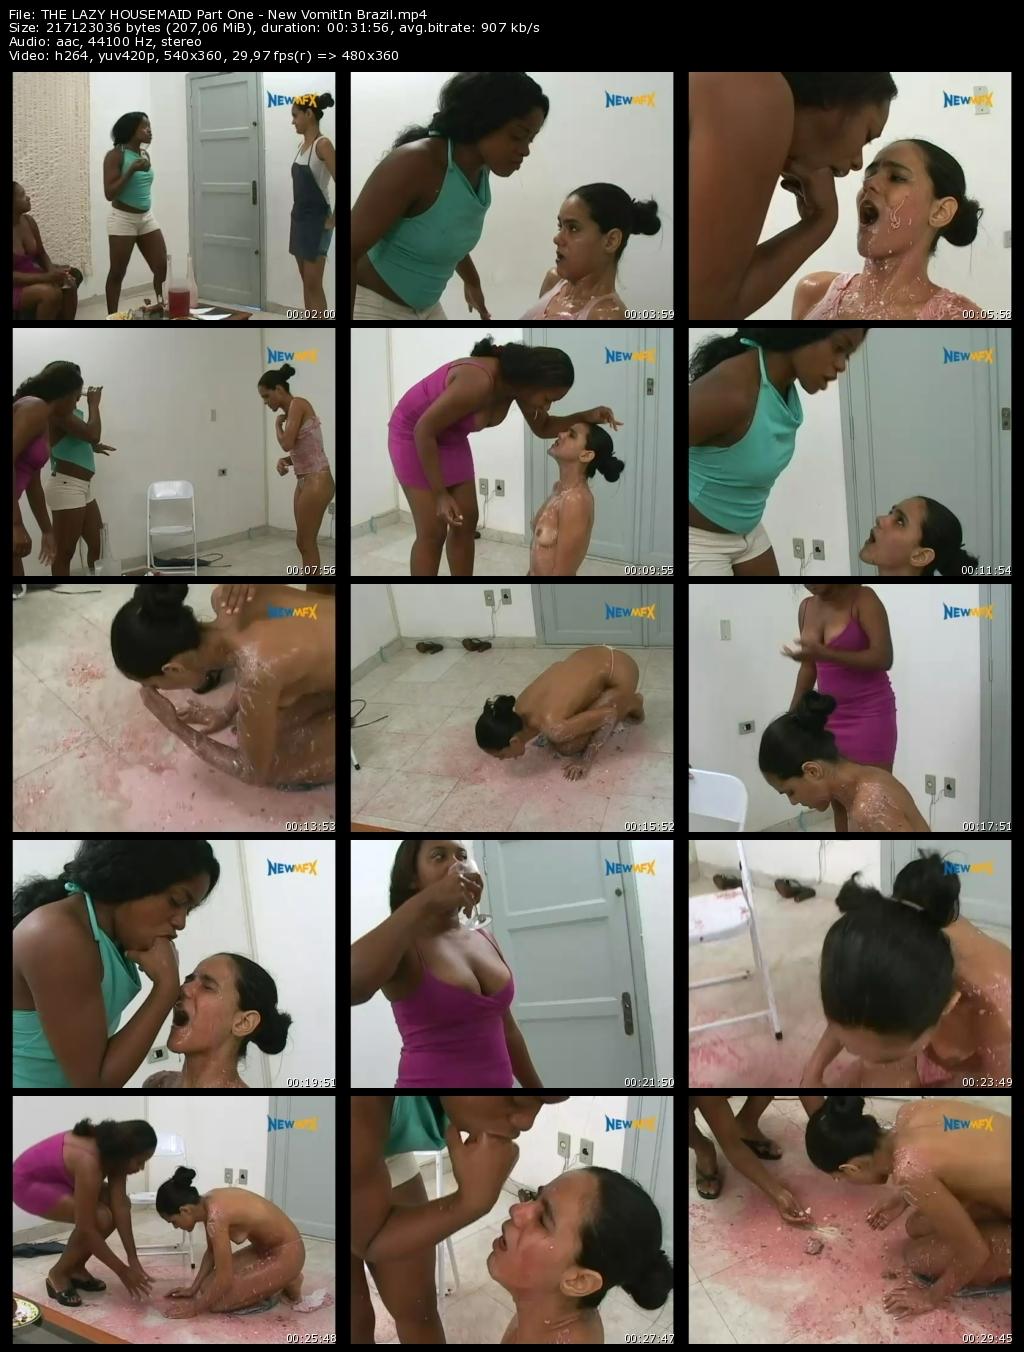 THE LAZY HOUSEMAID Part One - New VomitIn Brazil with Amanda, Iris and Najara